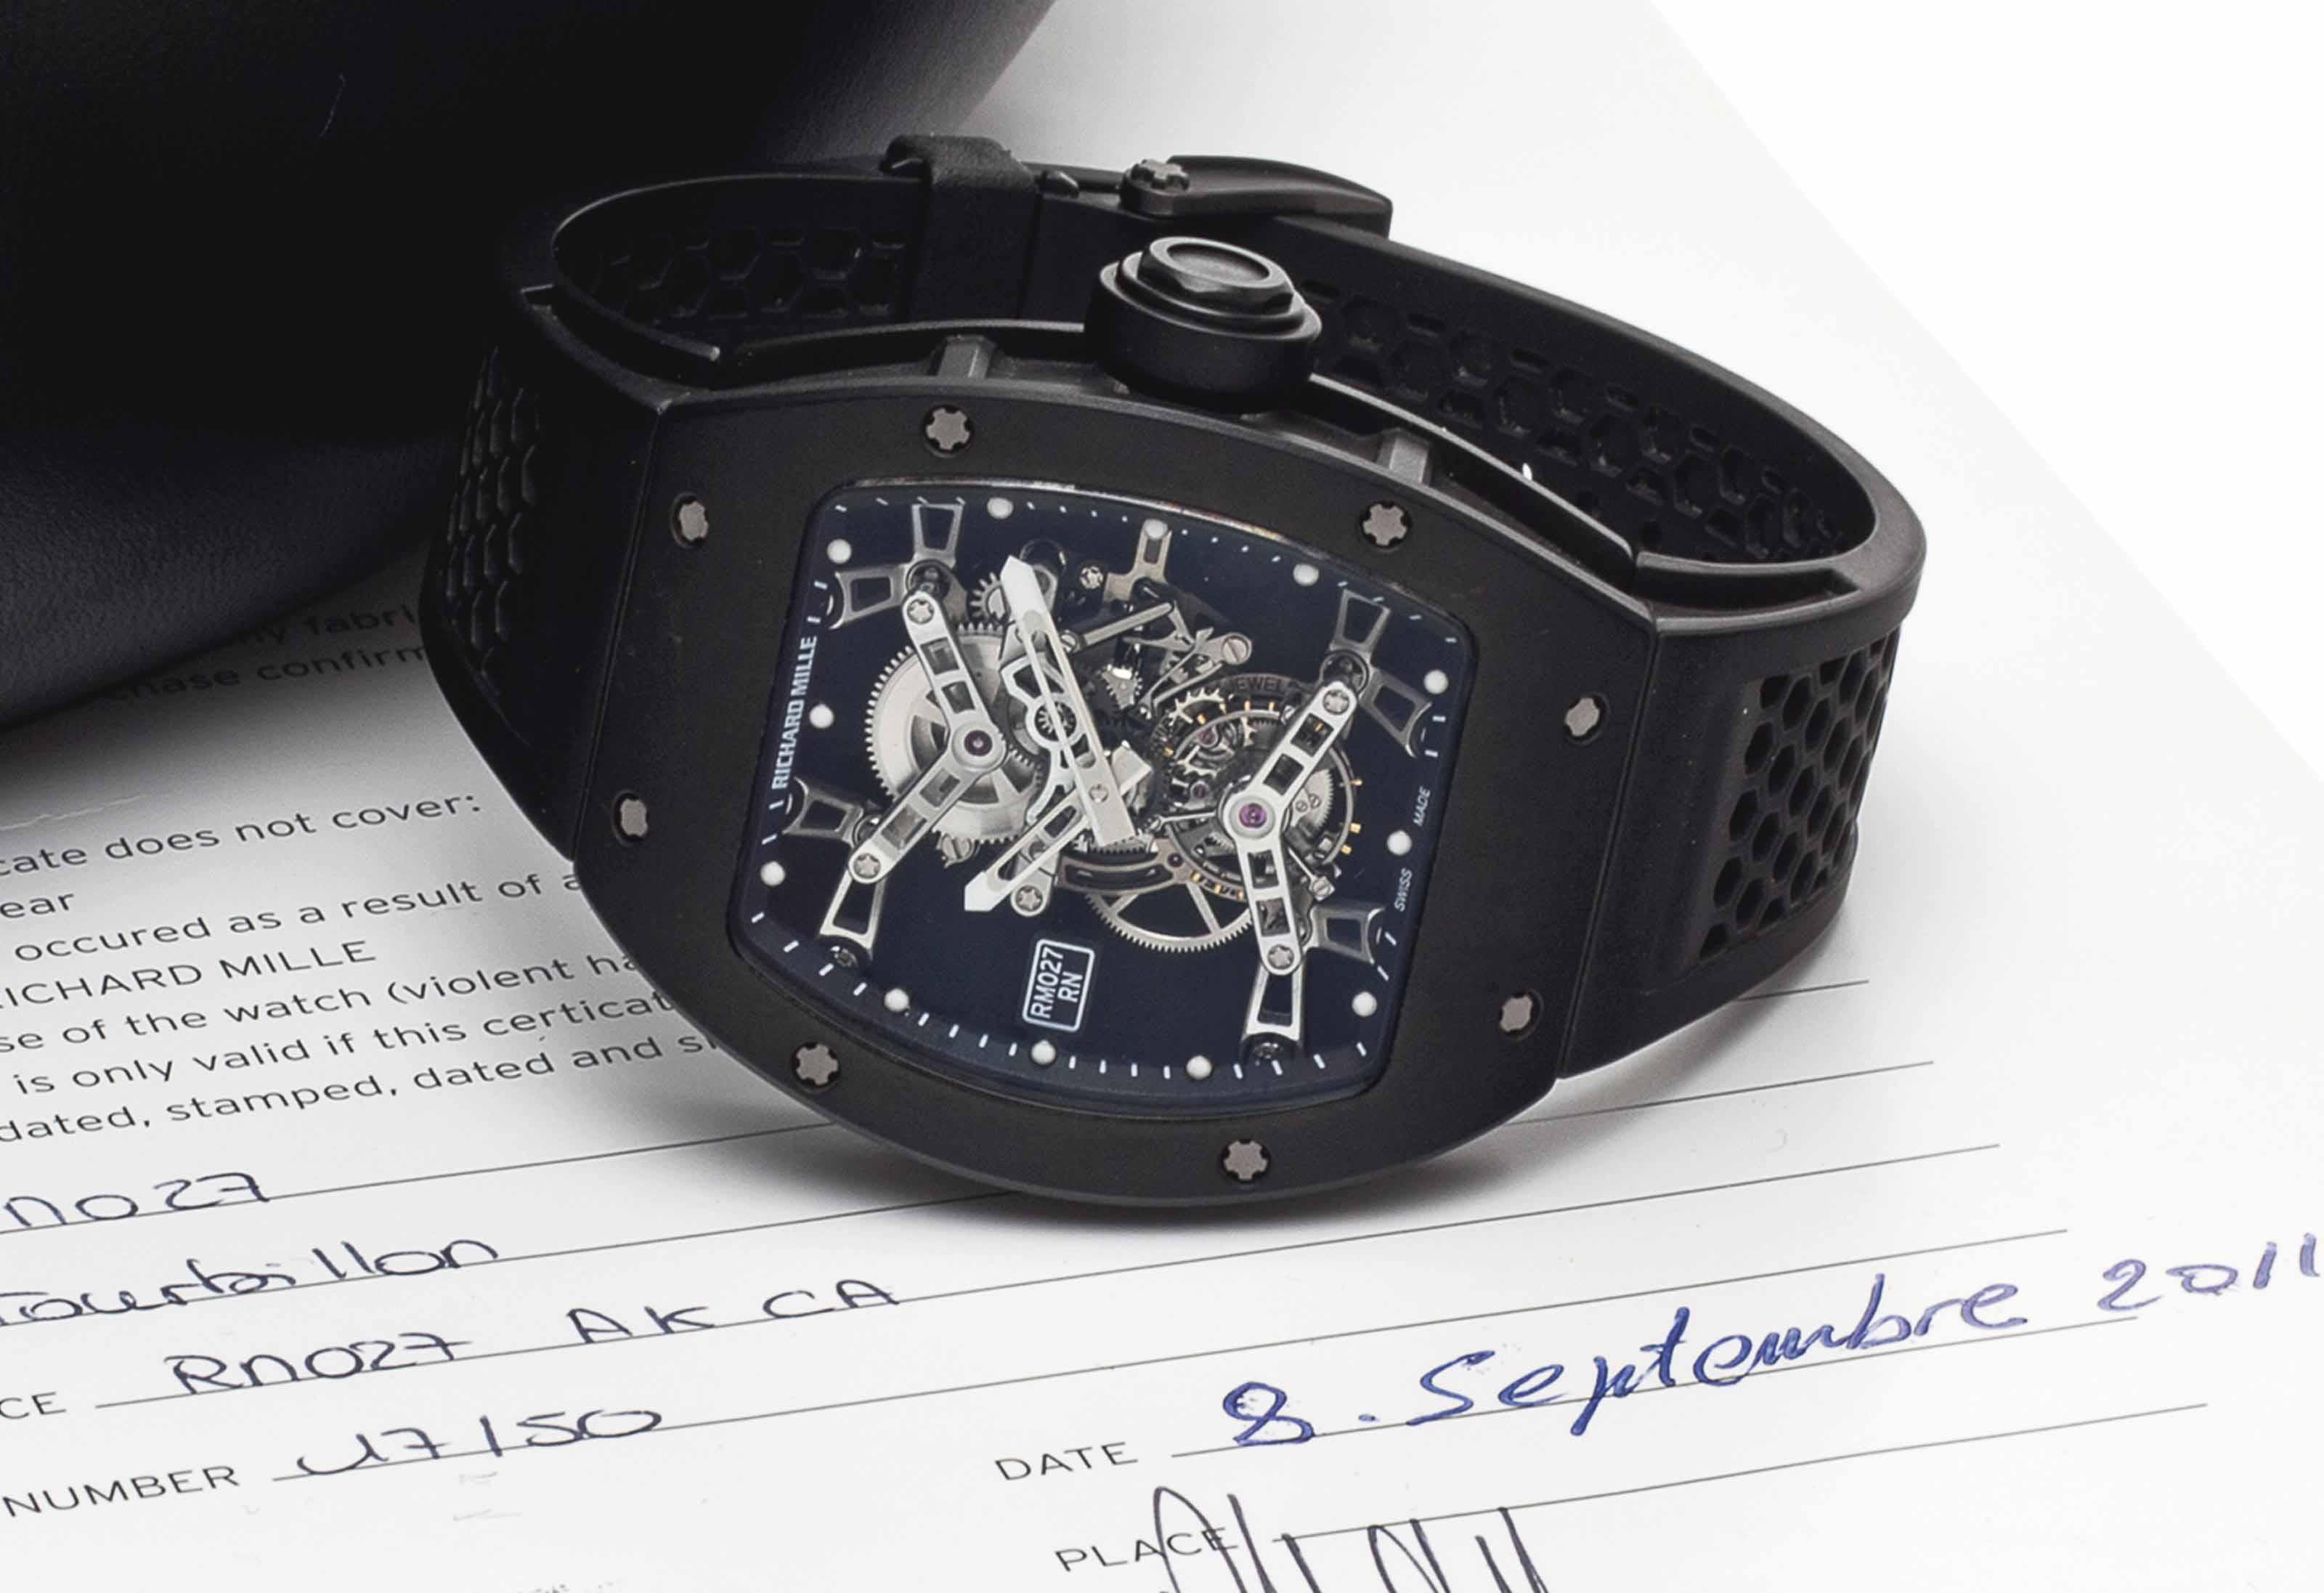 Richard Mille. A Fine and Rare Limited Edition Titanium Skeletonized Wristwatch with Tourbillon